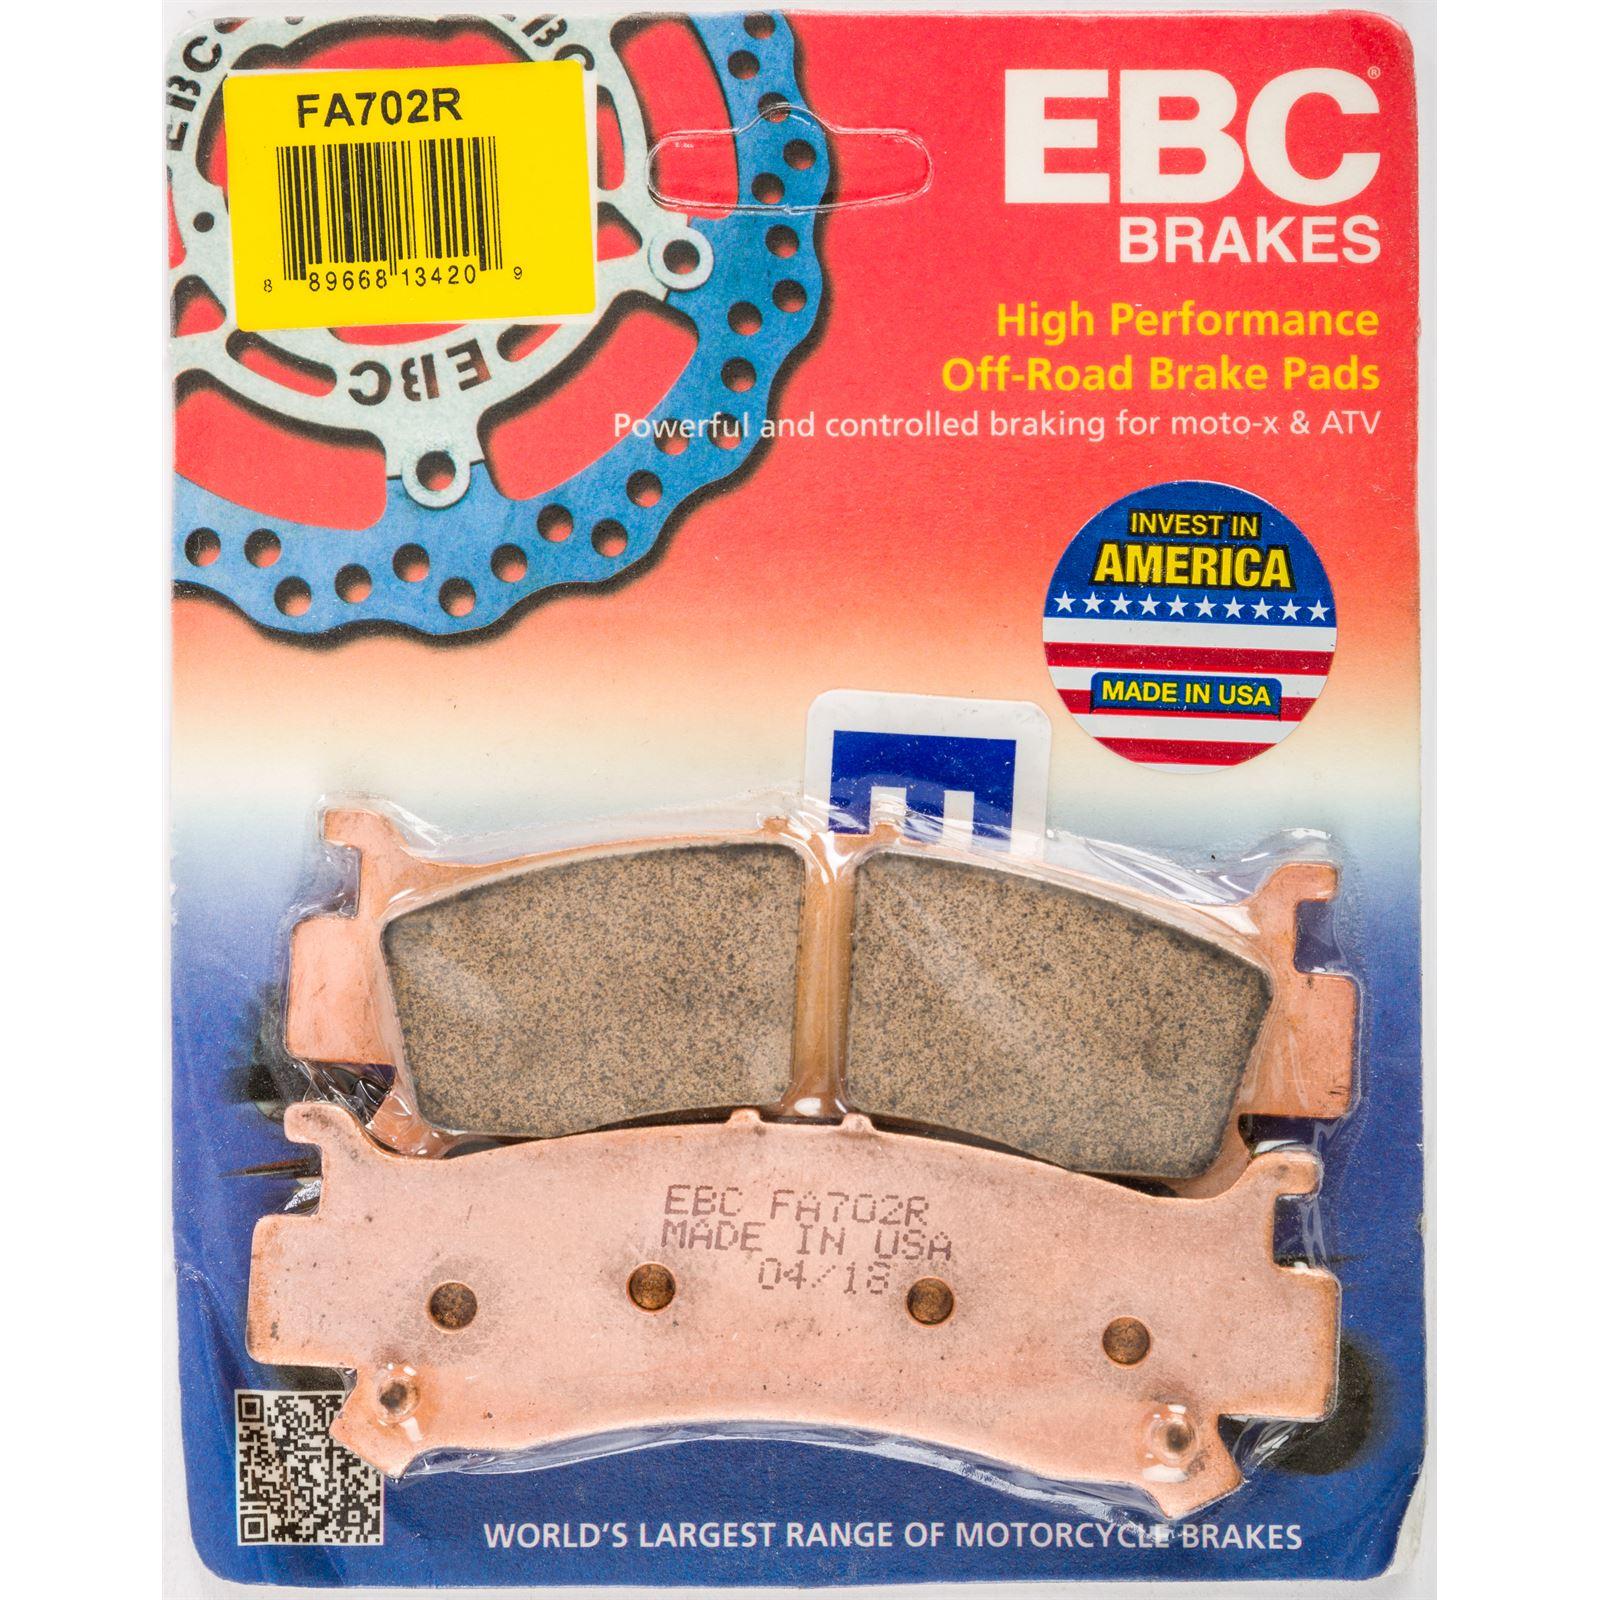 EBC High Performance Brake Pads